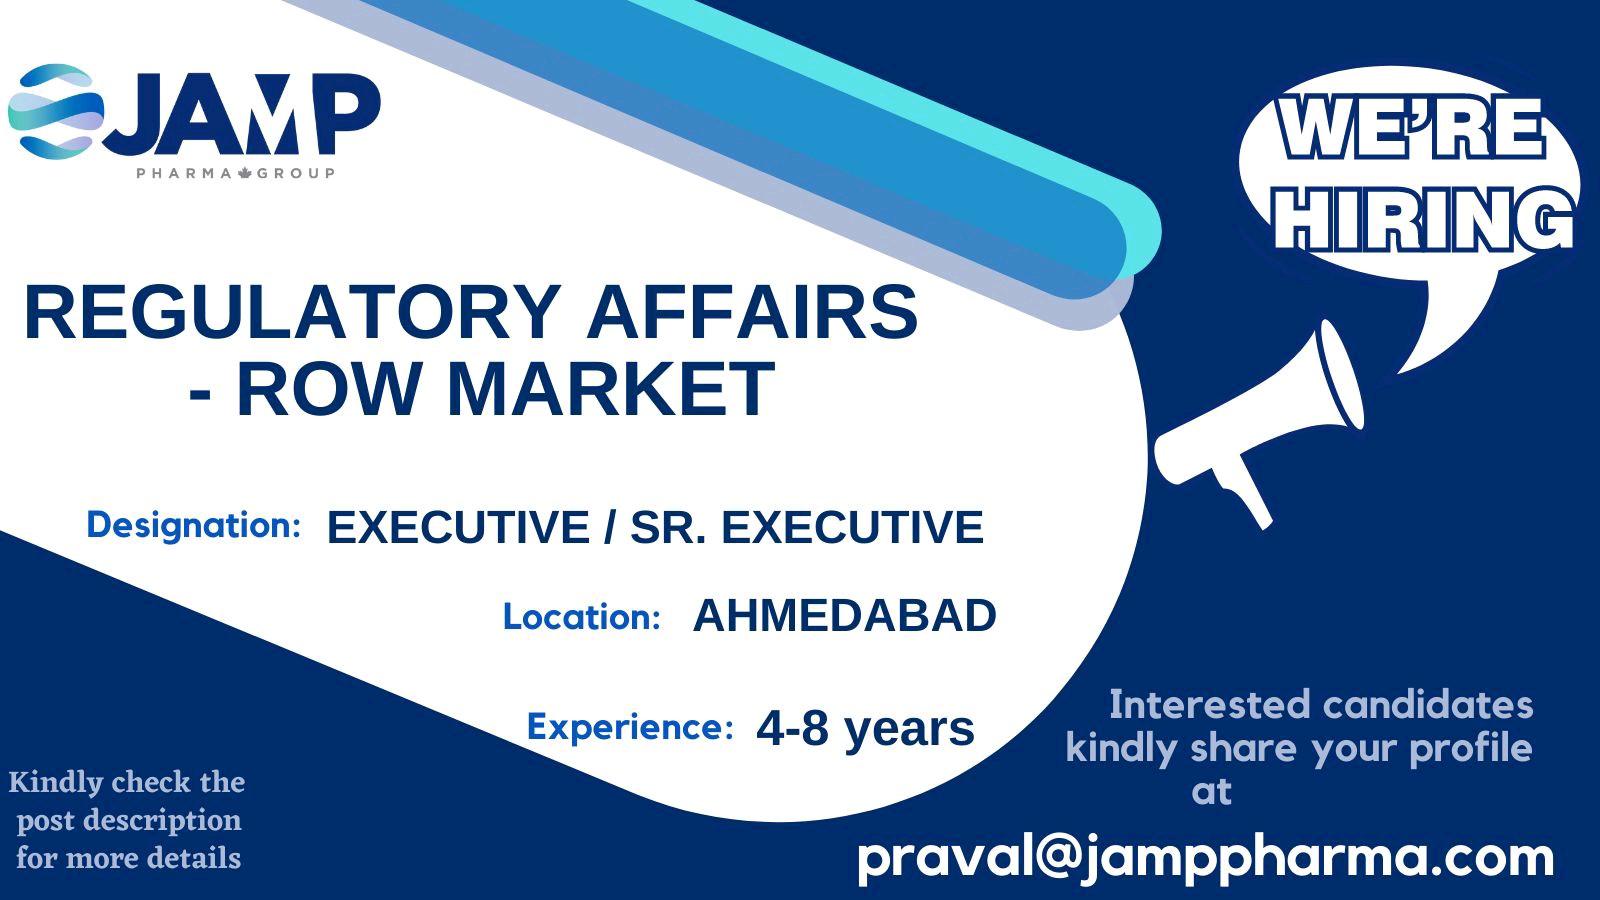 Opening For Regulatory Affairs At JAMP Pharma